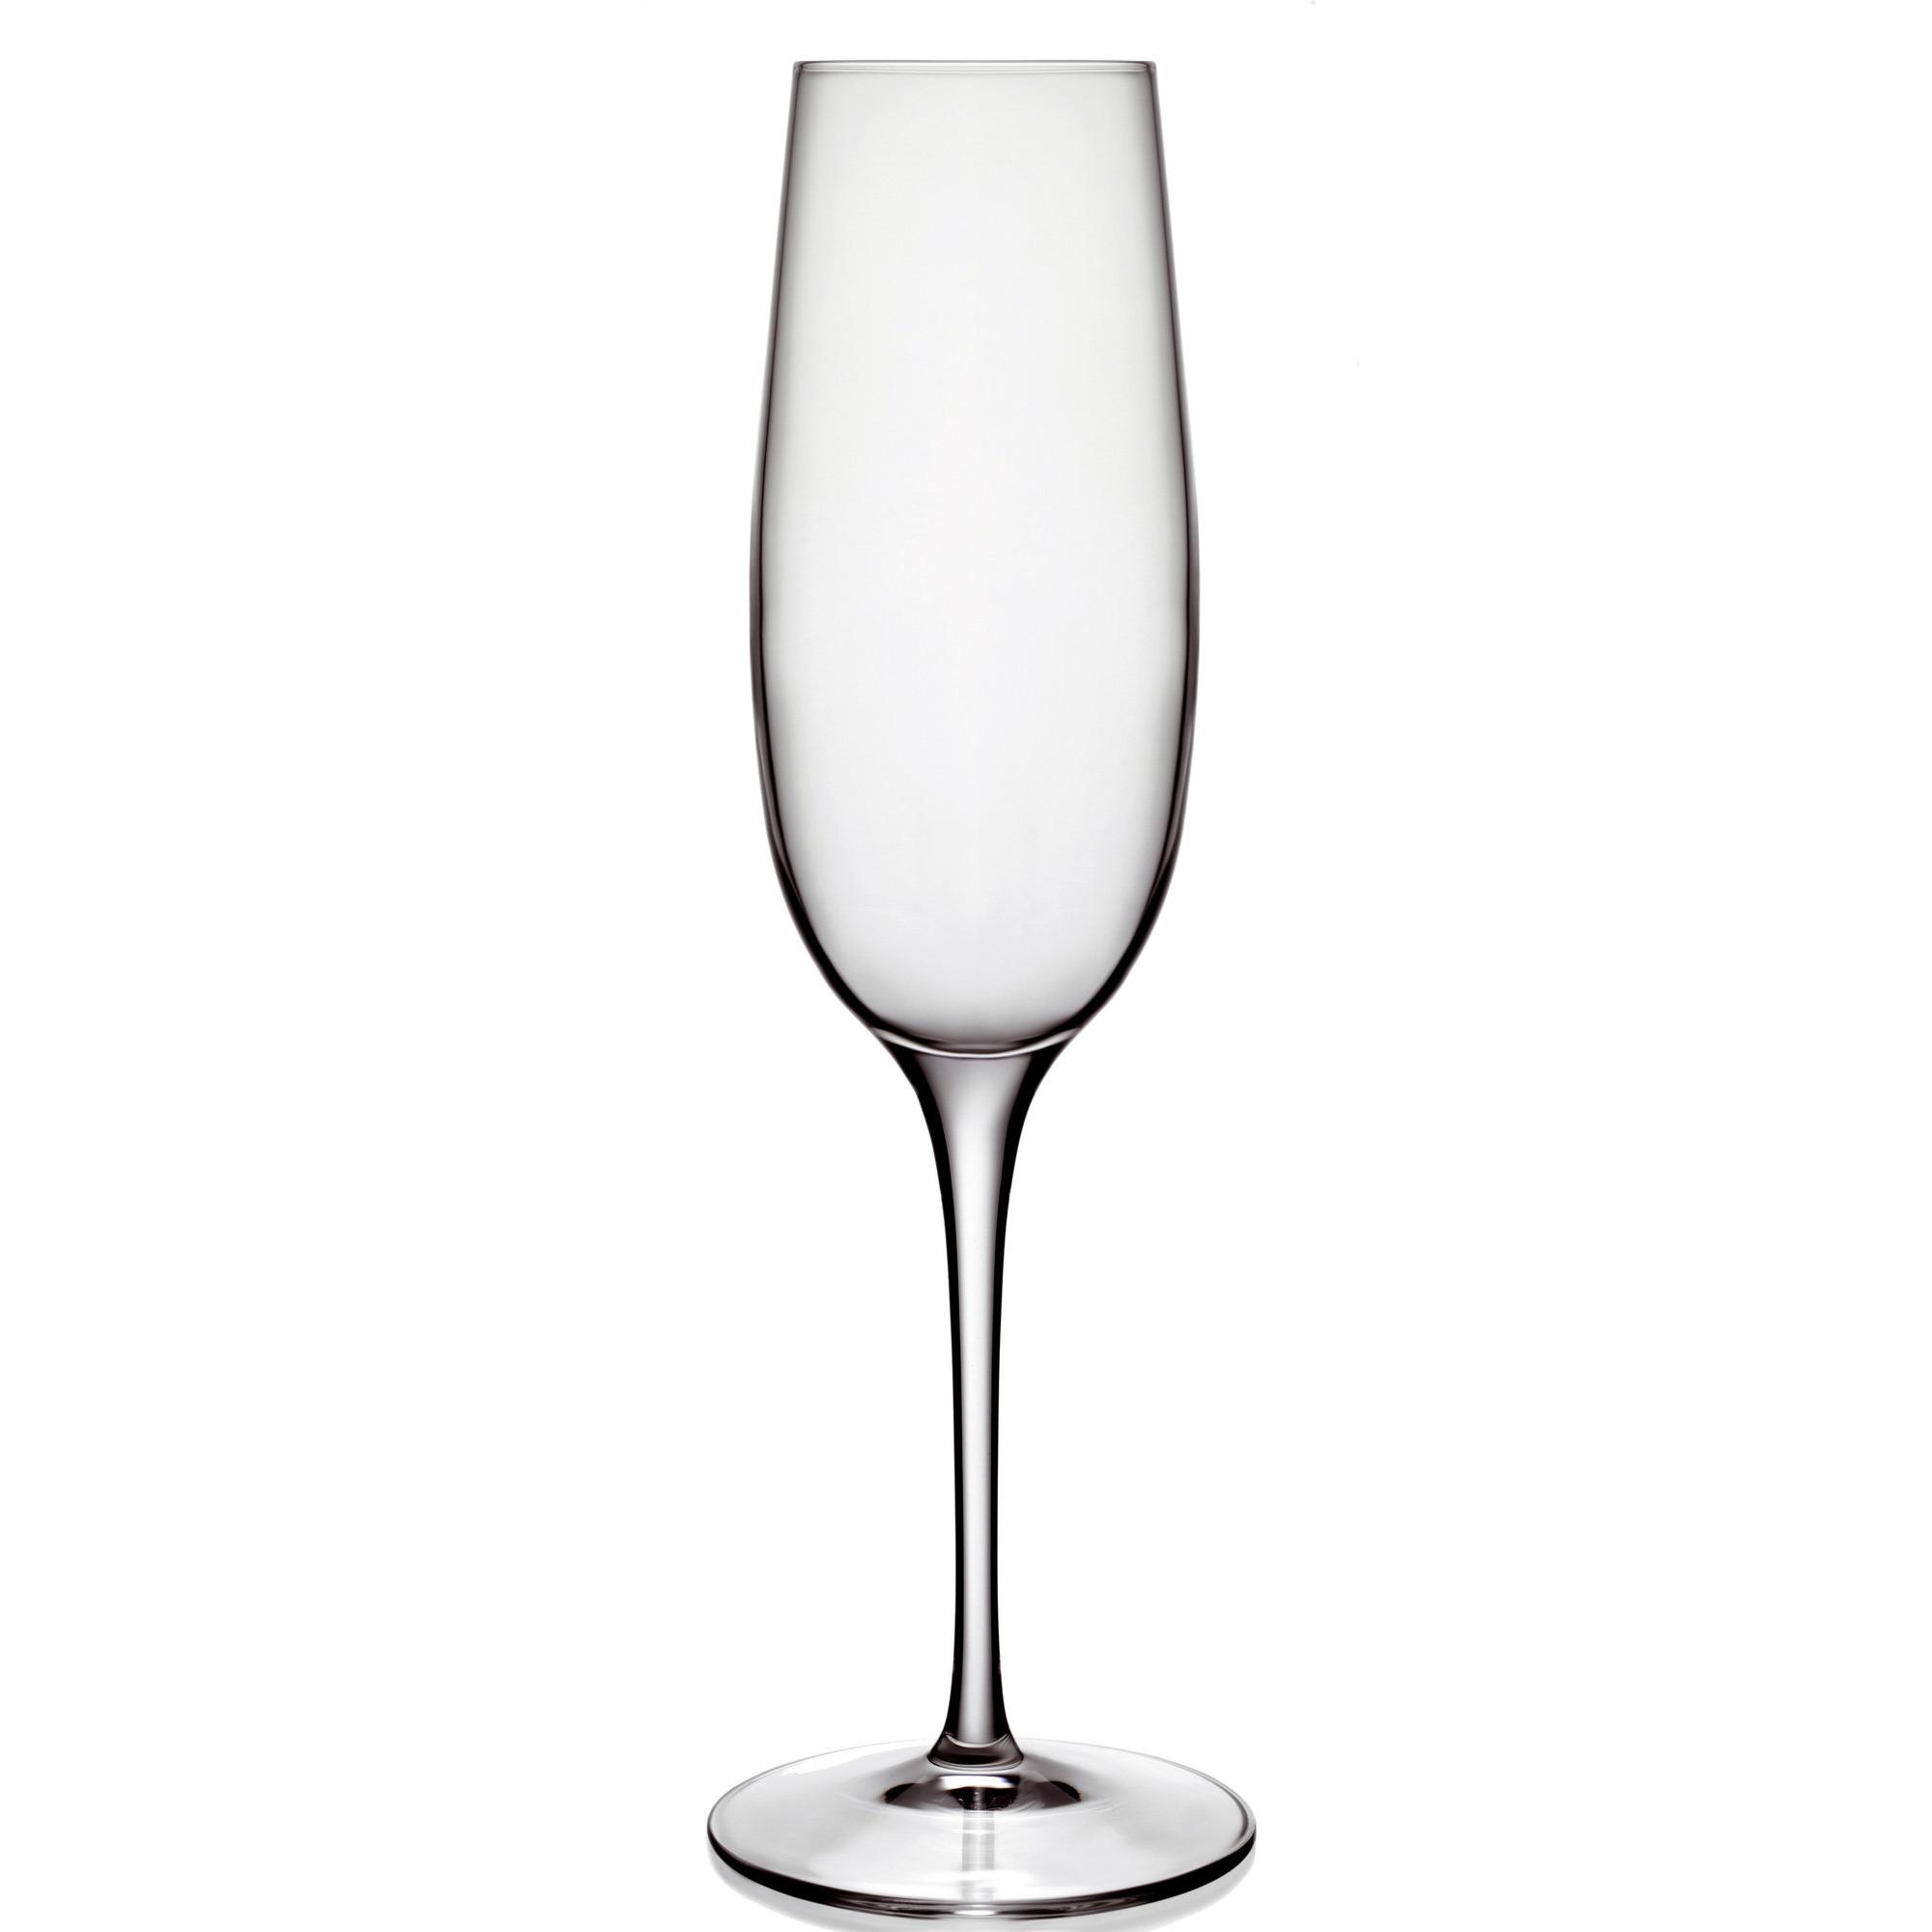 Luigi Bormioli Palace champagneglas 6 st.